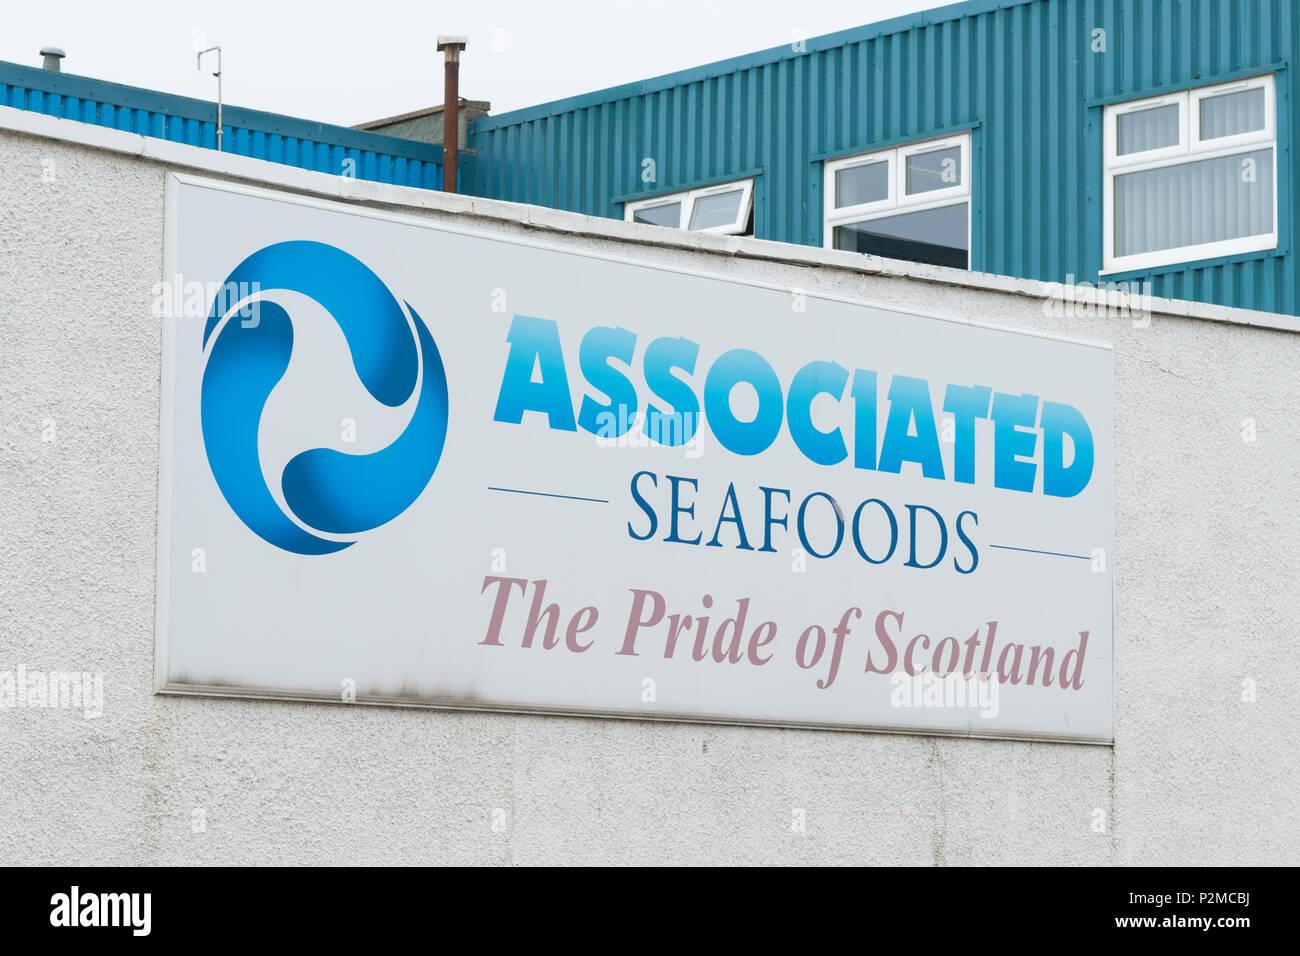 Associated Seafoods, Buckie, Moray, Scotland, UK - Stock Image